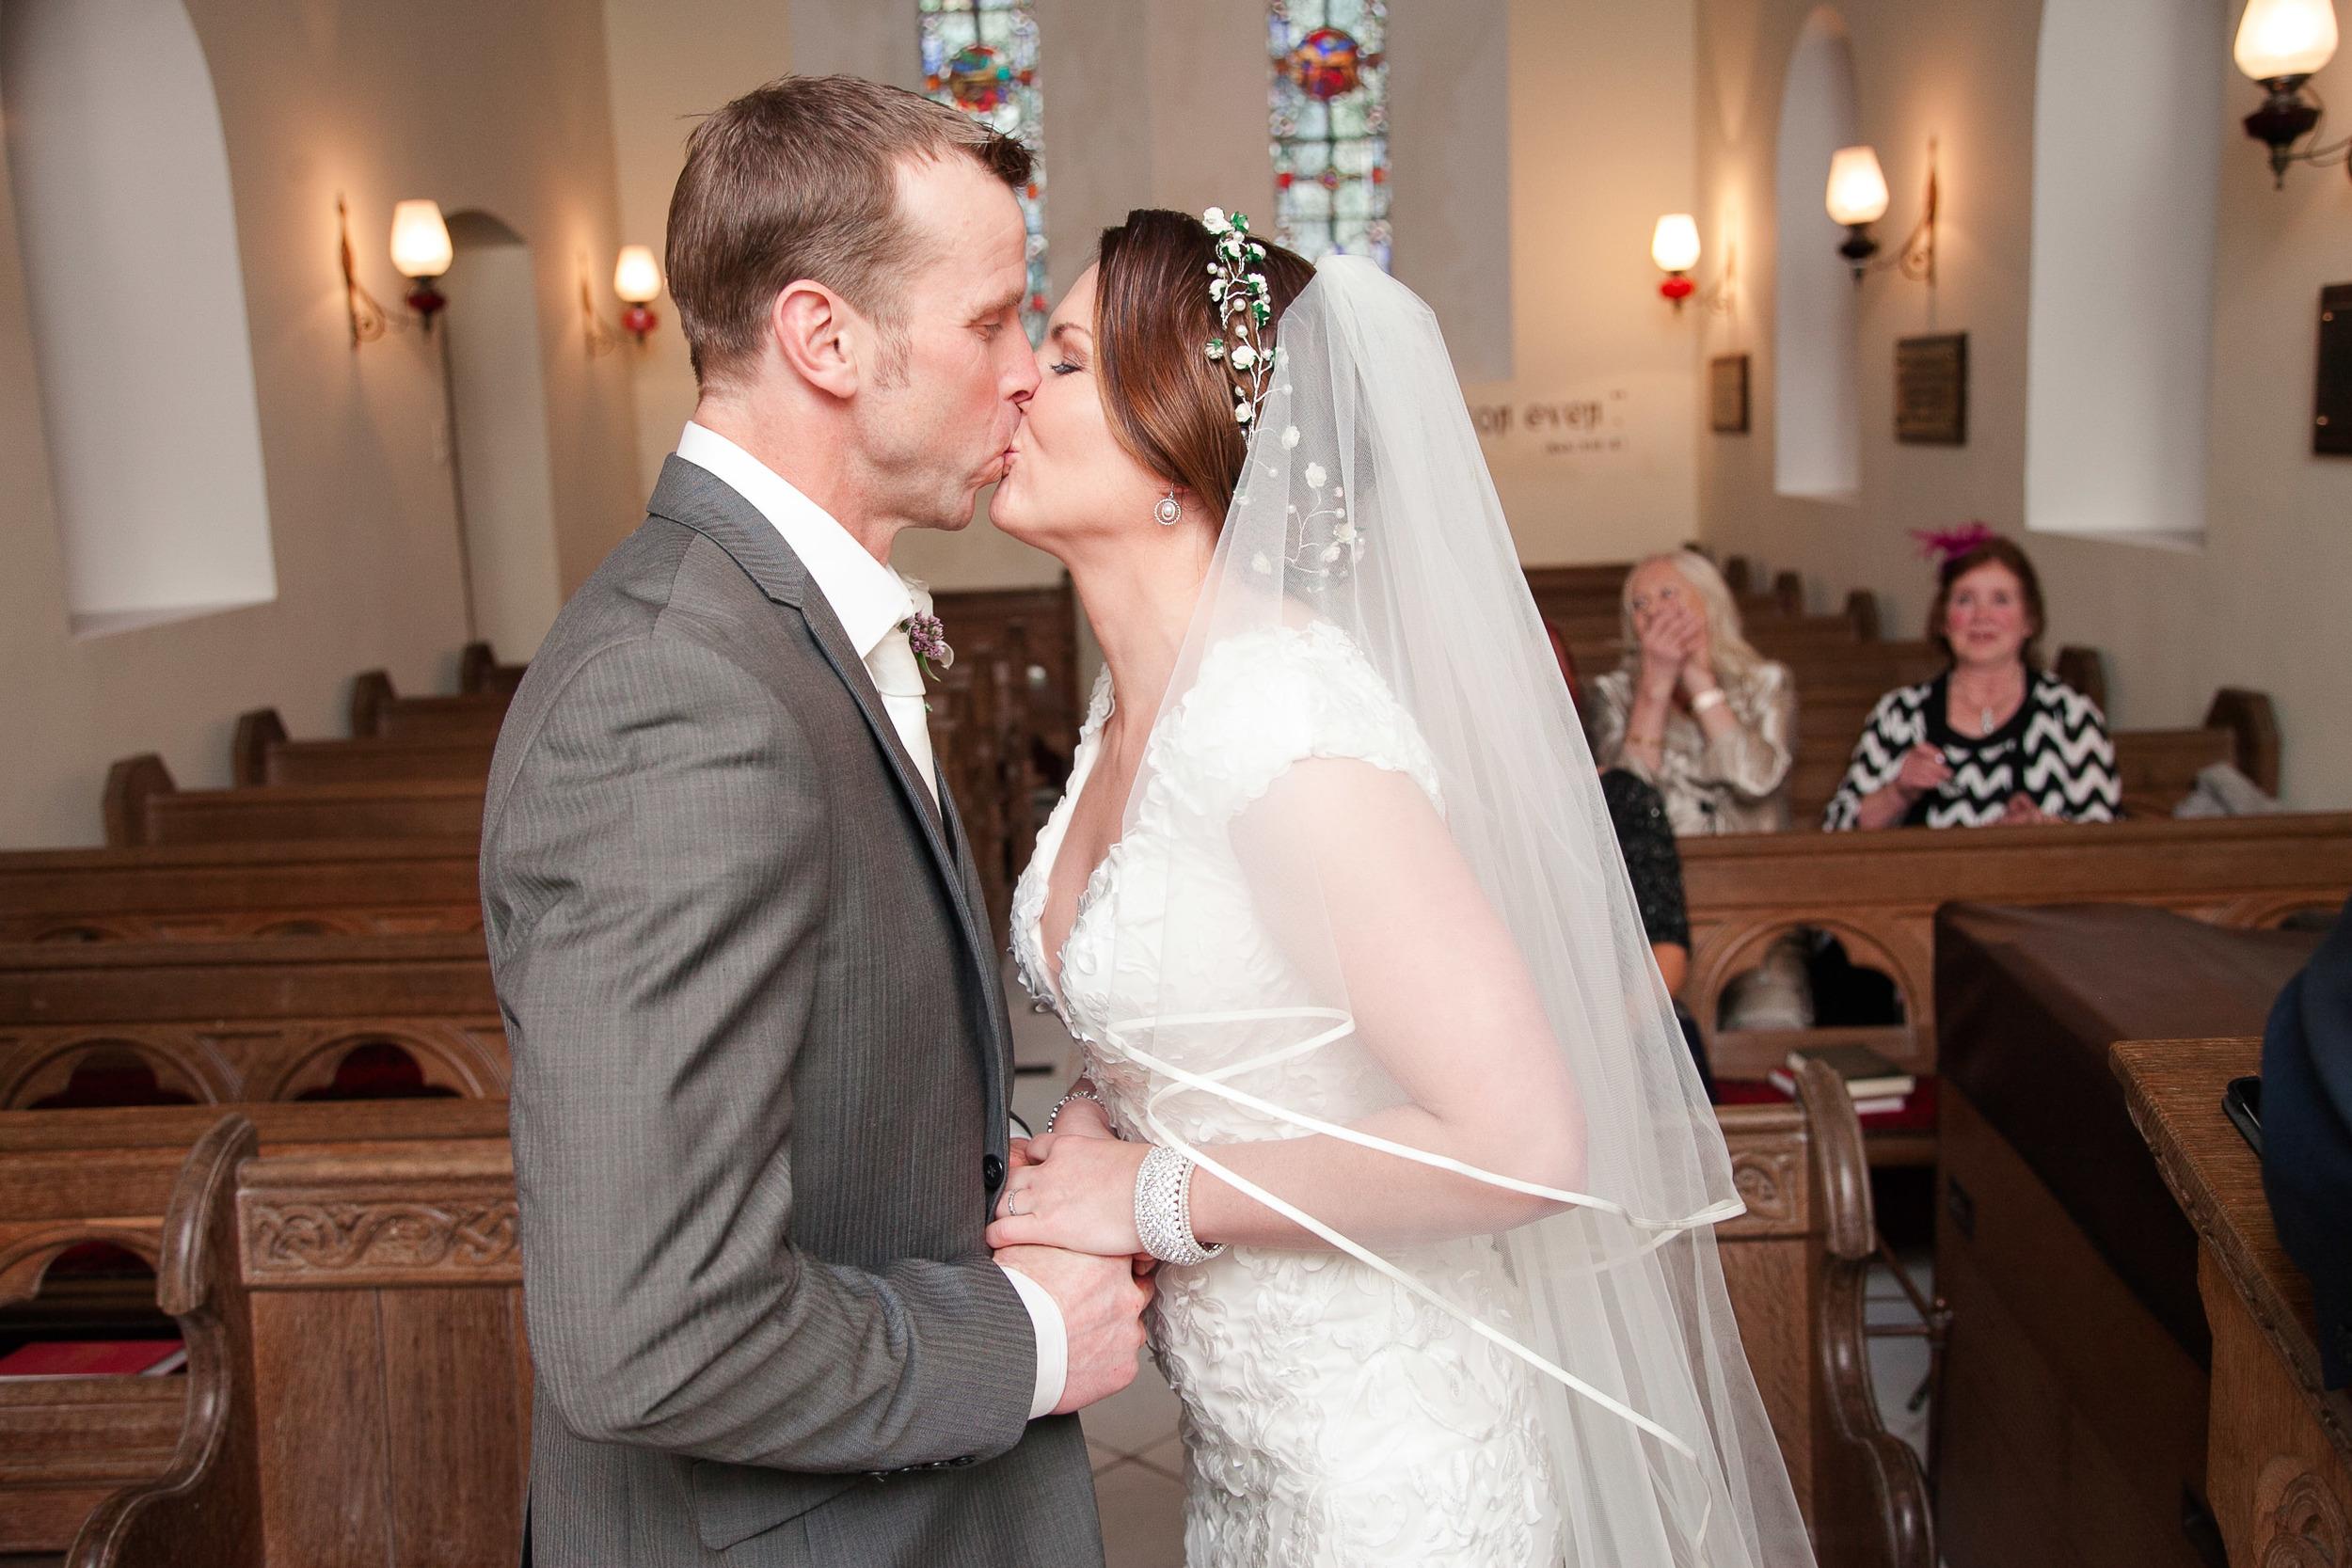 Ireland-Kildare-Wedding-Photographer-0010.jpg